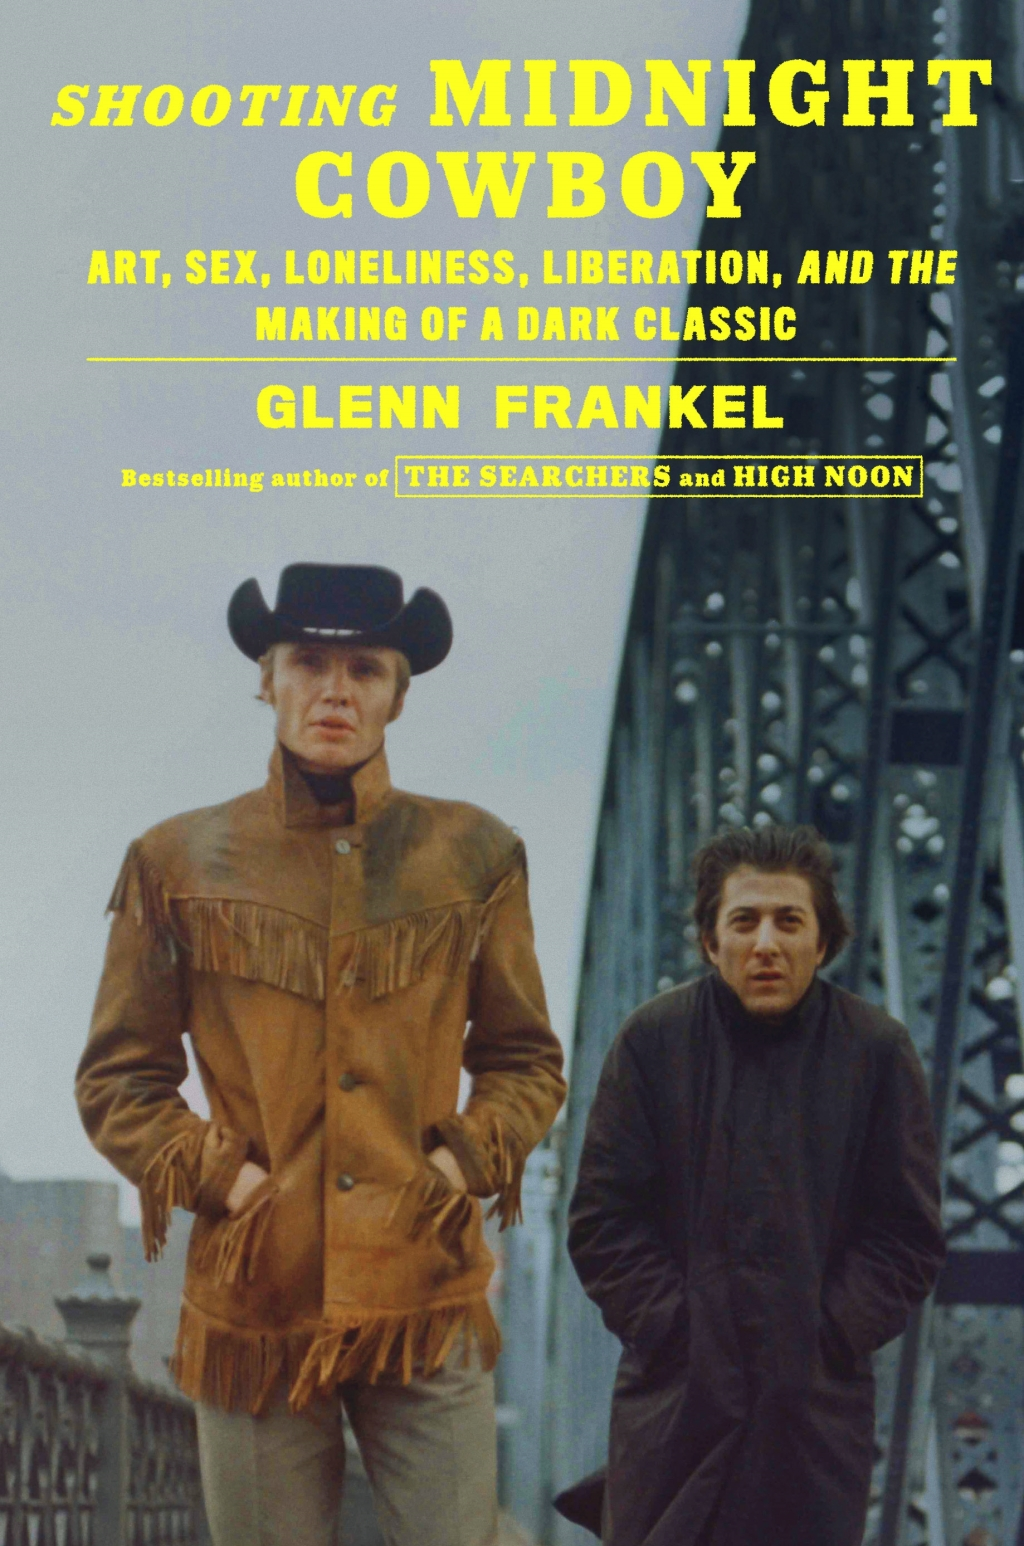 'Shooting Midnight Cowboy' by Glenn Frankel book cover